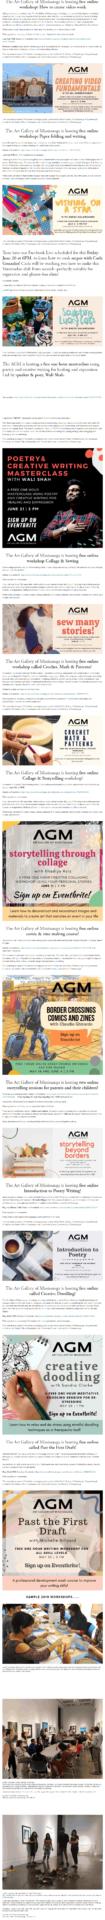 AGM Past Workshops